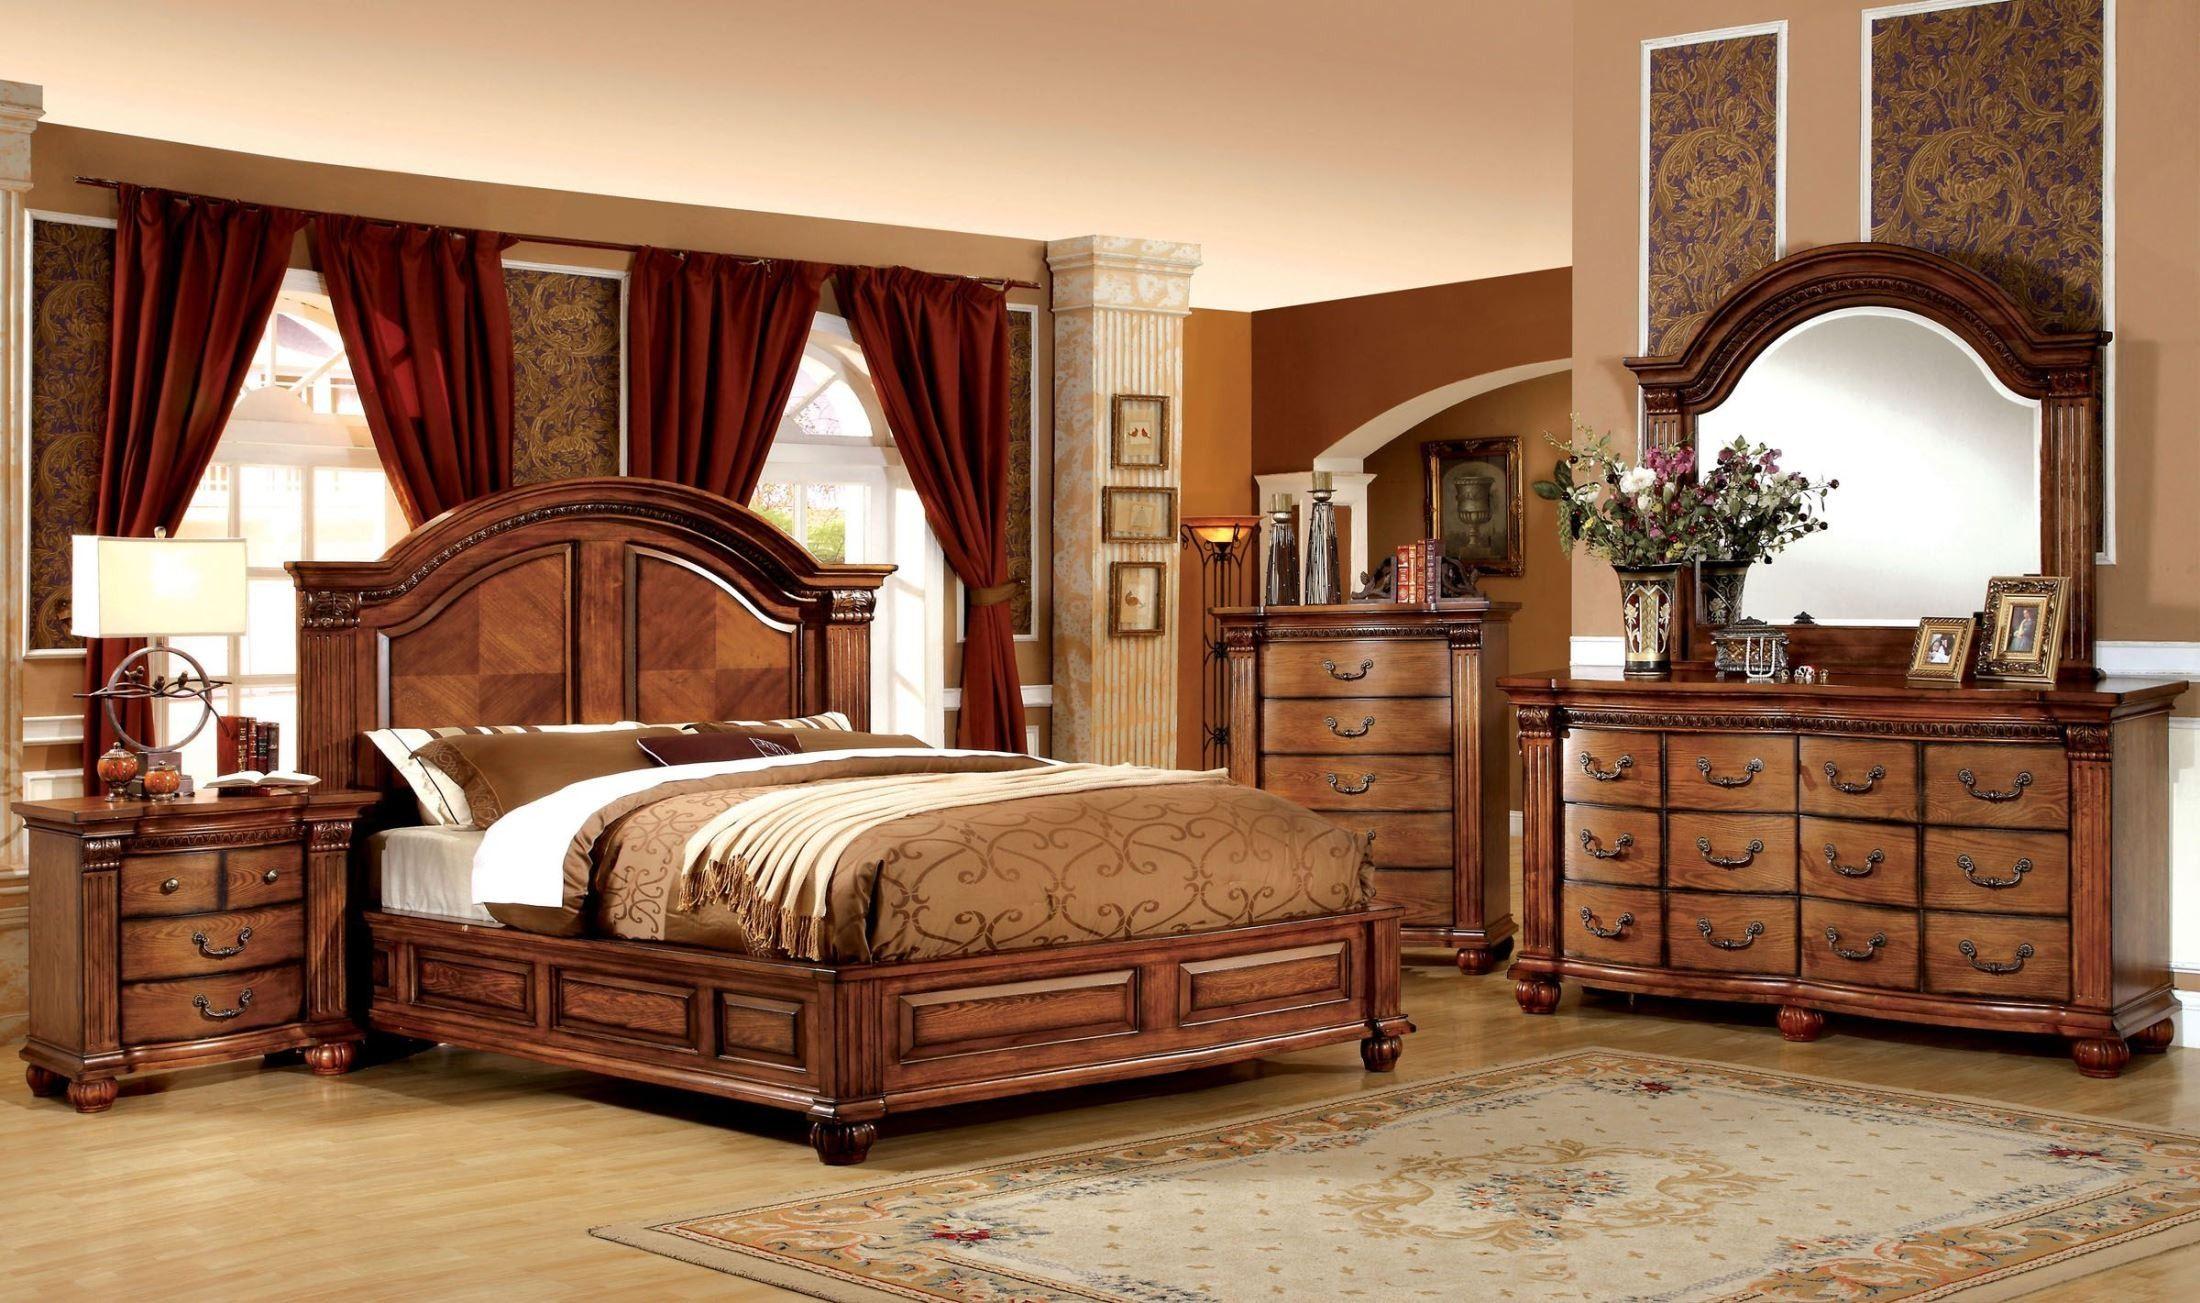 Bellagrand Antique Tobacco Oak Bedroom Set Wood Bedroom Sets King Bedroom Sets Bedroom Furniture Sets